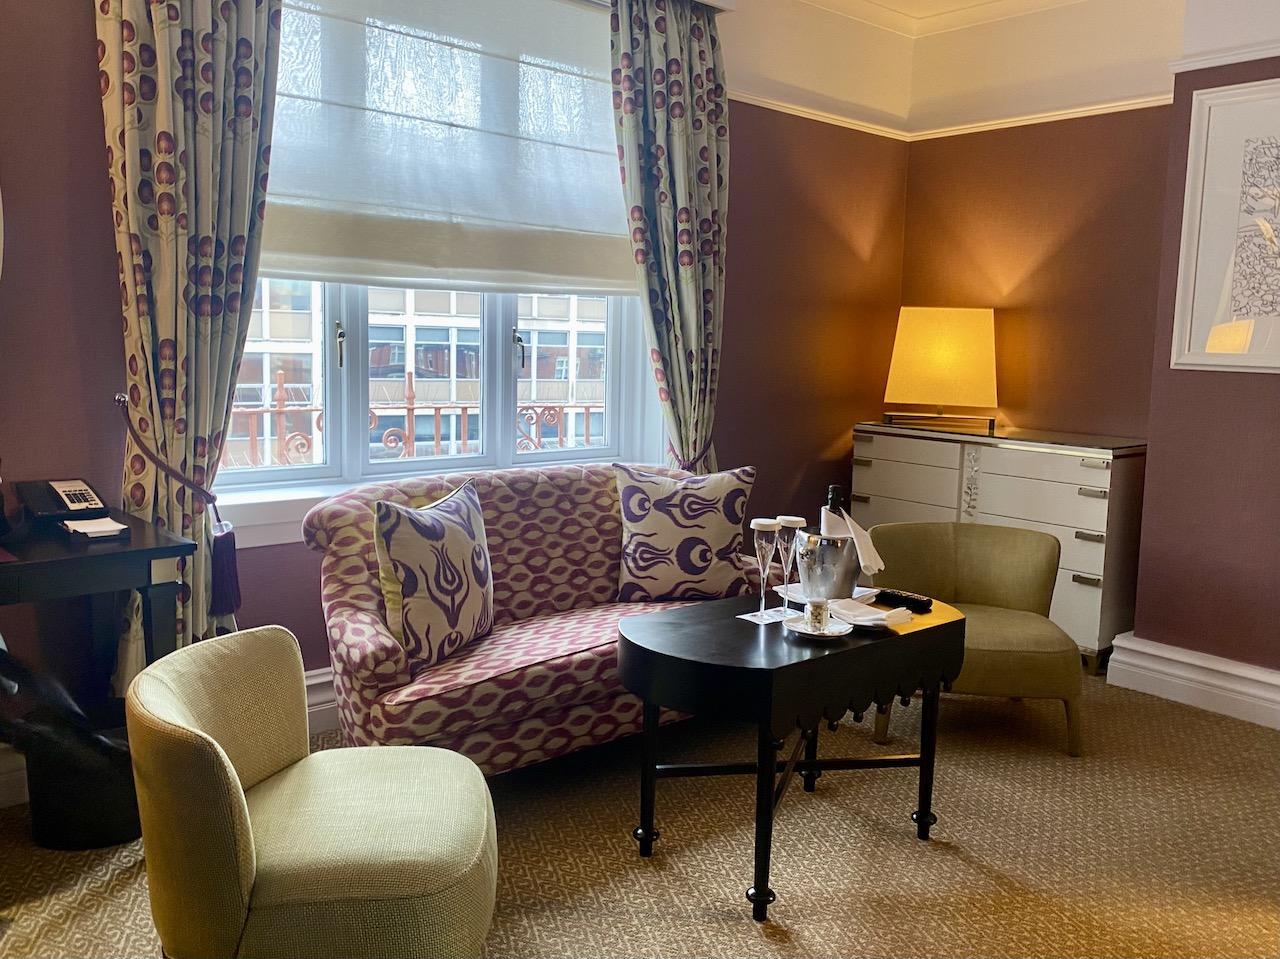 St Ermin's Hotel suite